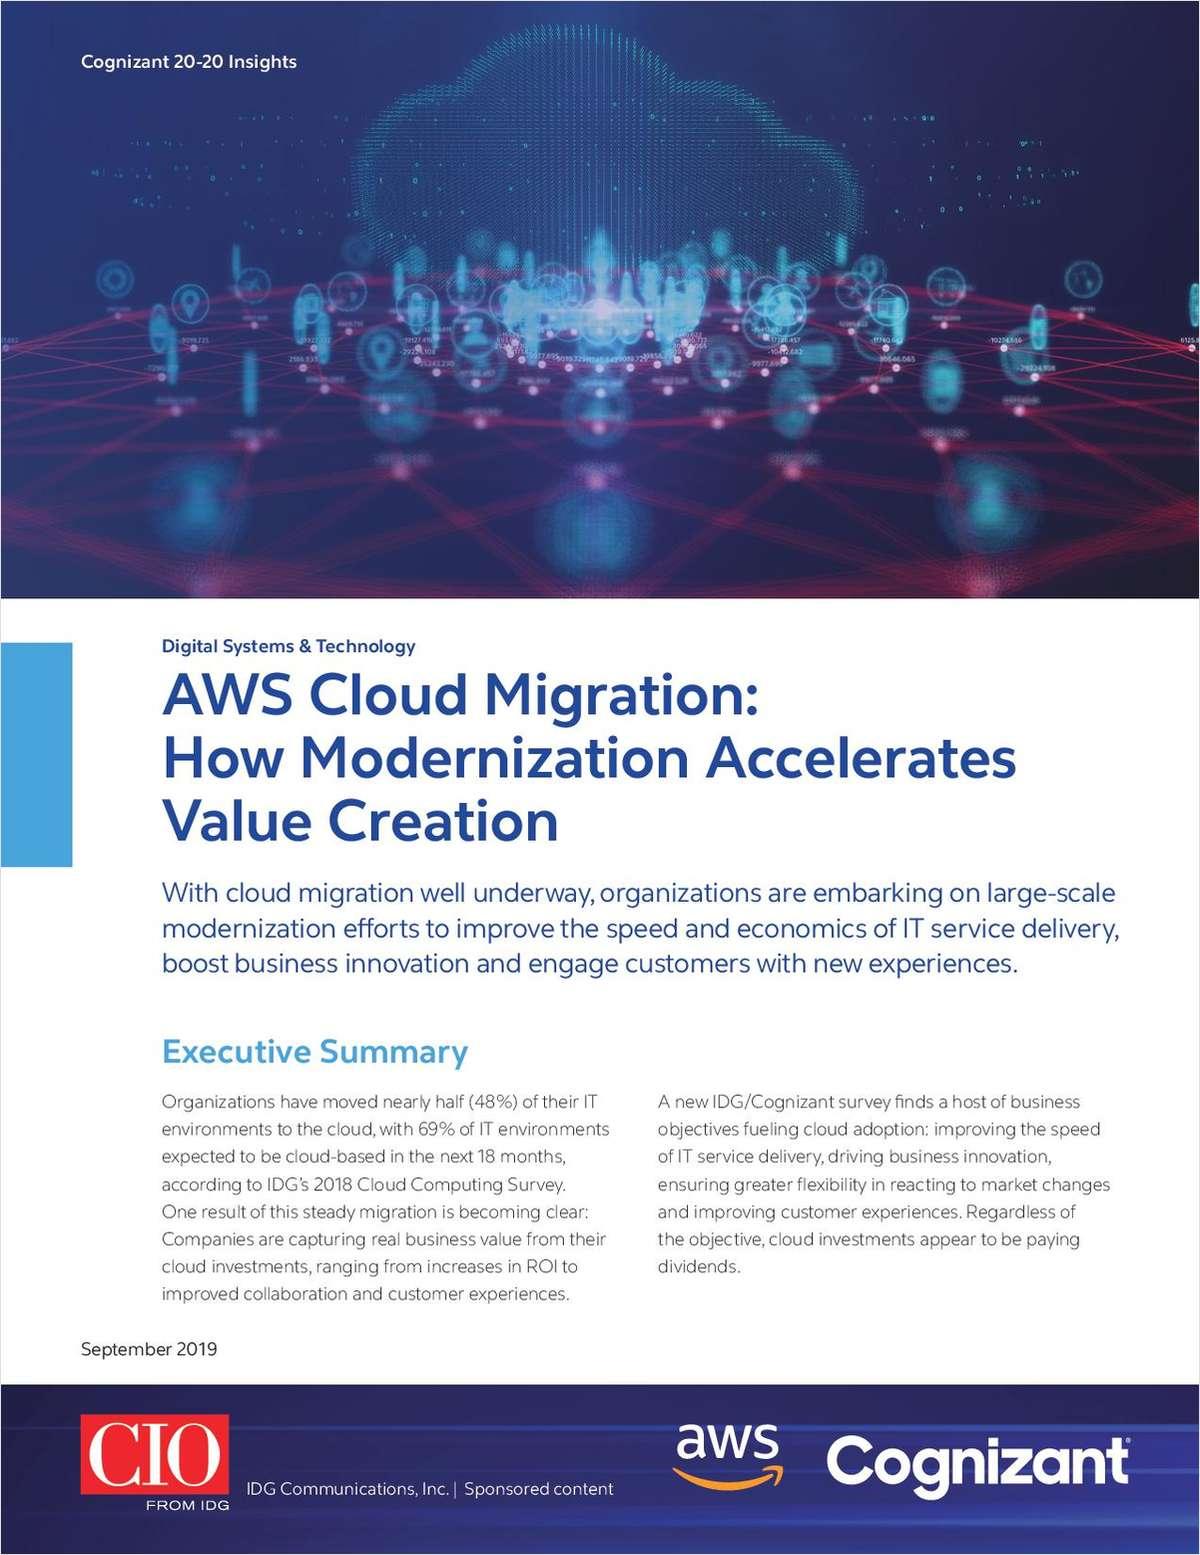 AWS Cloud Migration: How Modernization Accelerates Value Creation